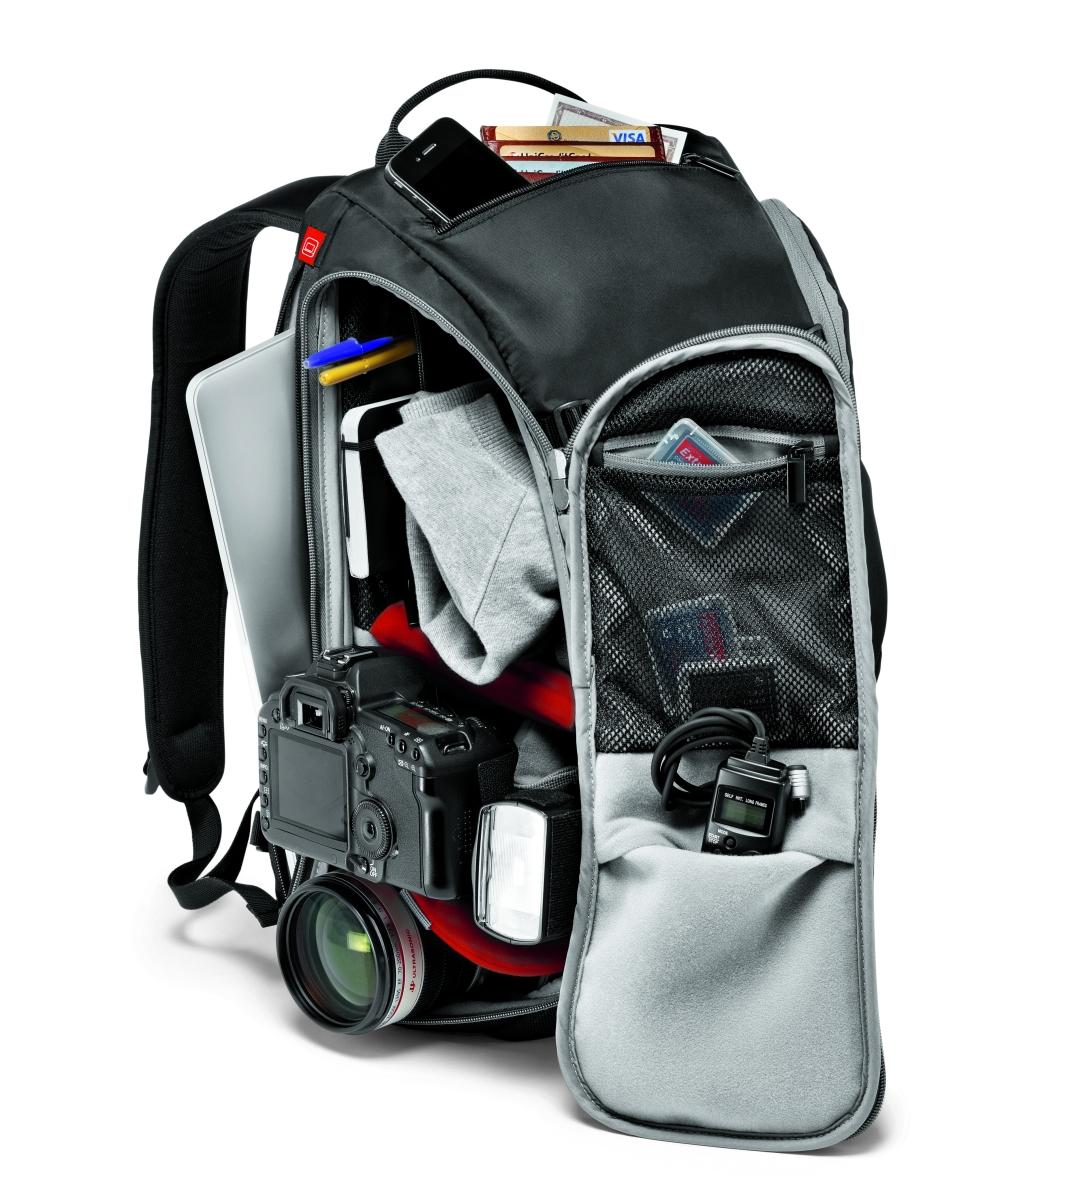 Рюкзак manfrotto ma-bp-trv advanced travel backpack - цена, .